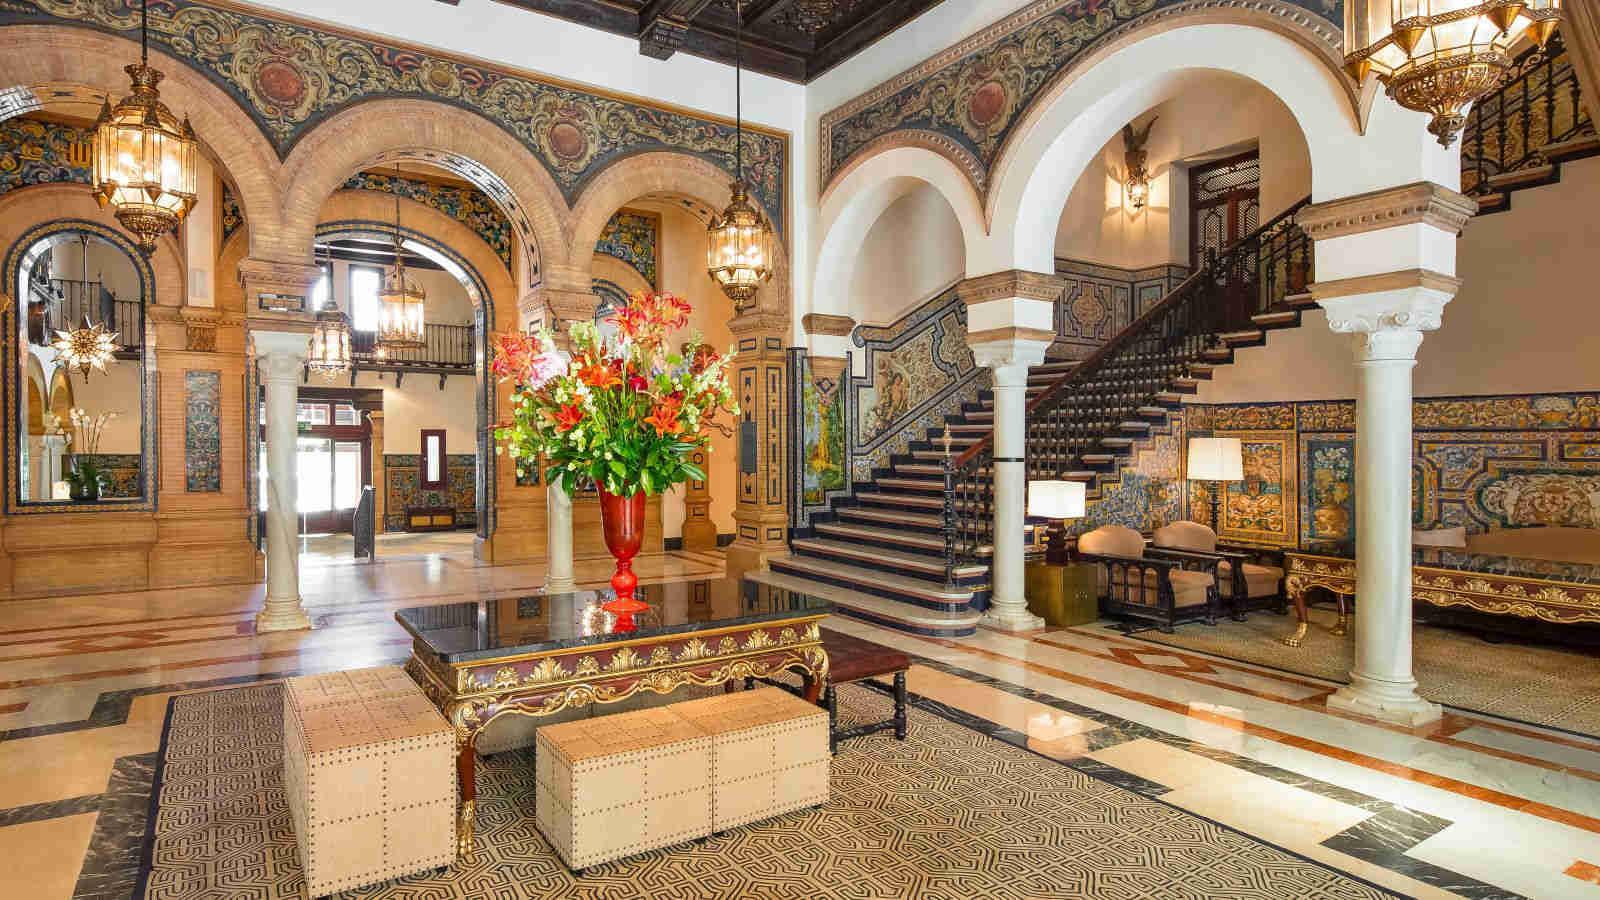 Hotel alfonso xiii haute grandeur - Hotel alfonso xii sevilla ...